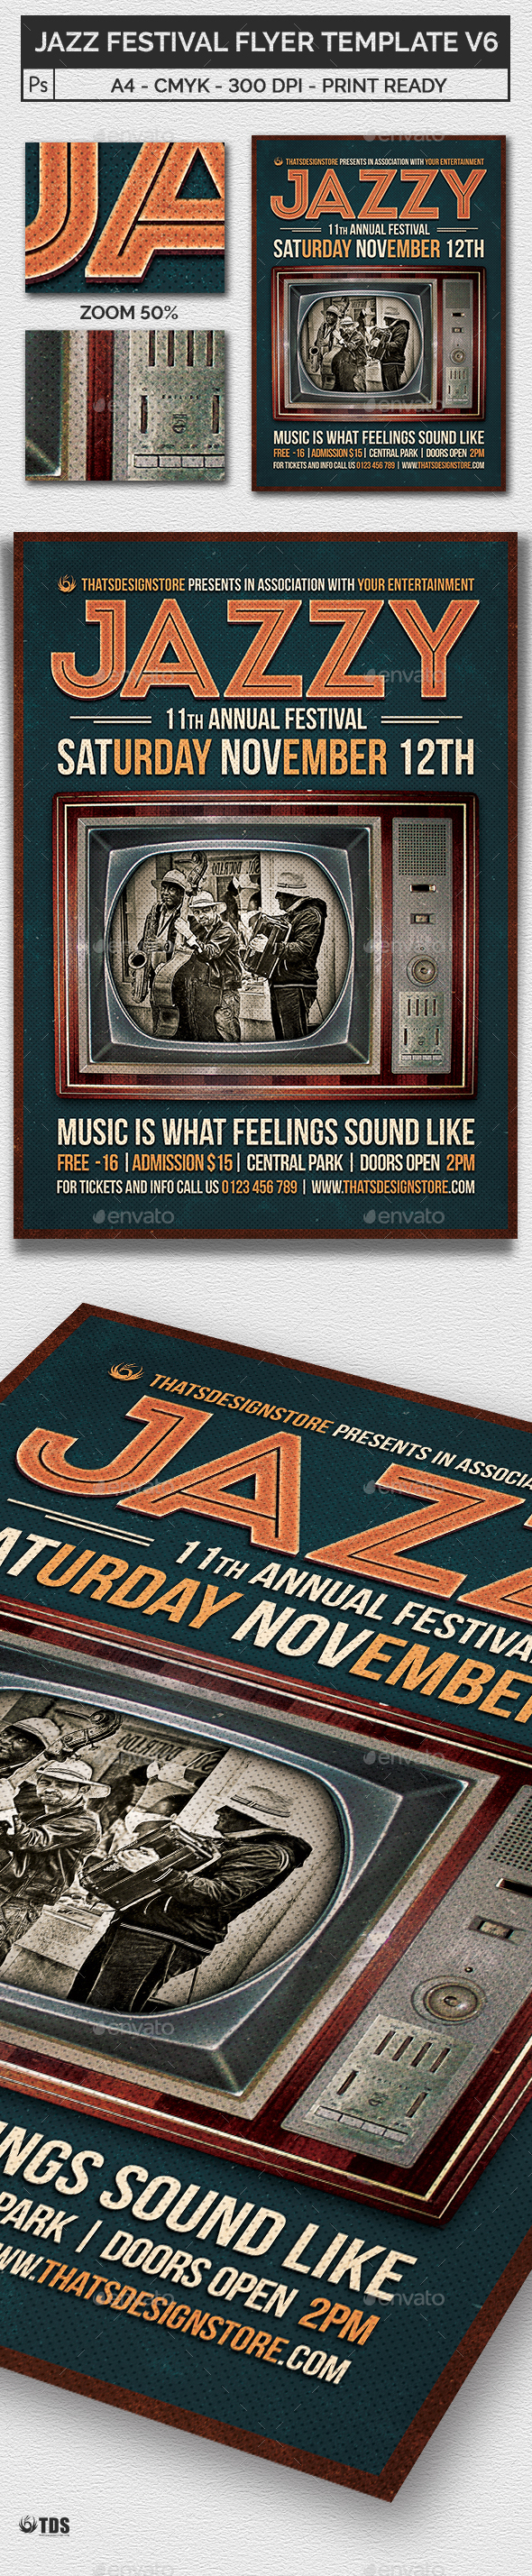 Jazz Festival Flyer Template V6 - Concerts Events